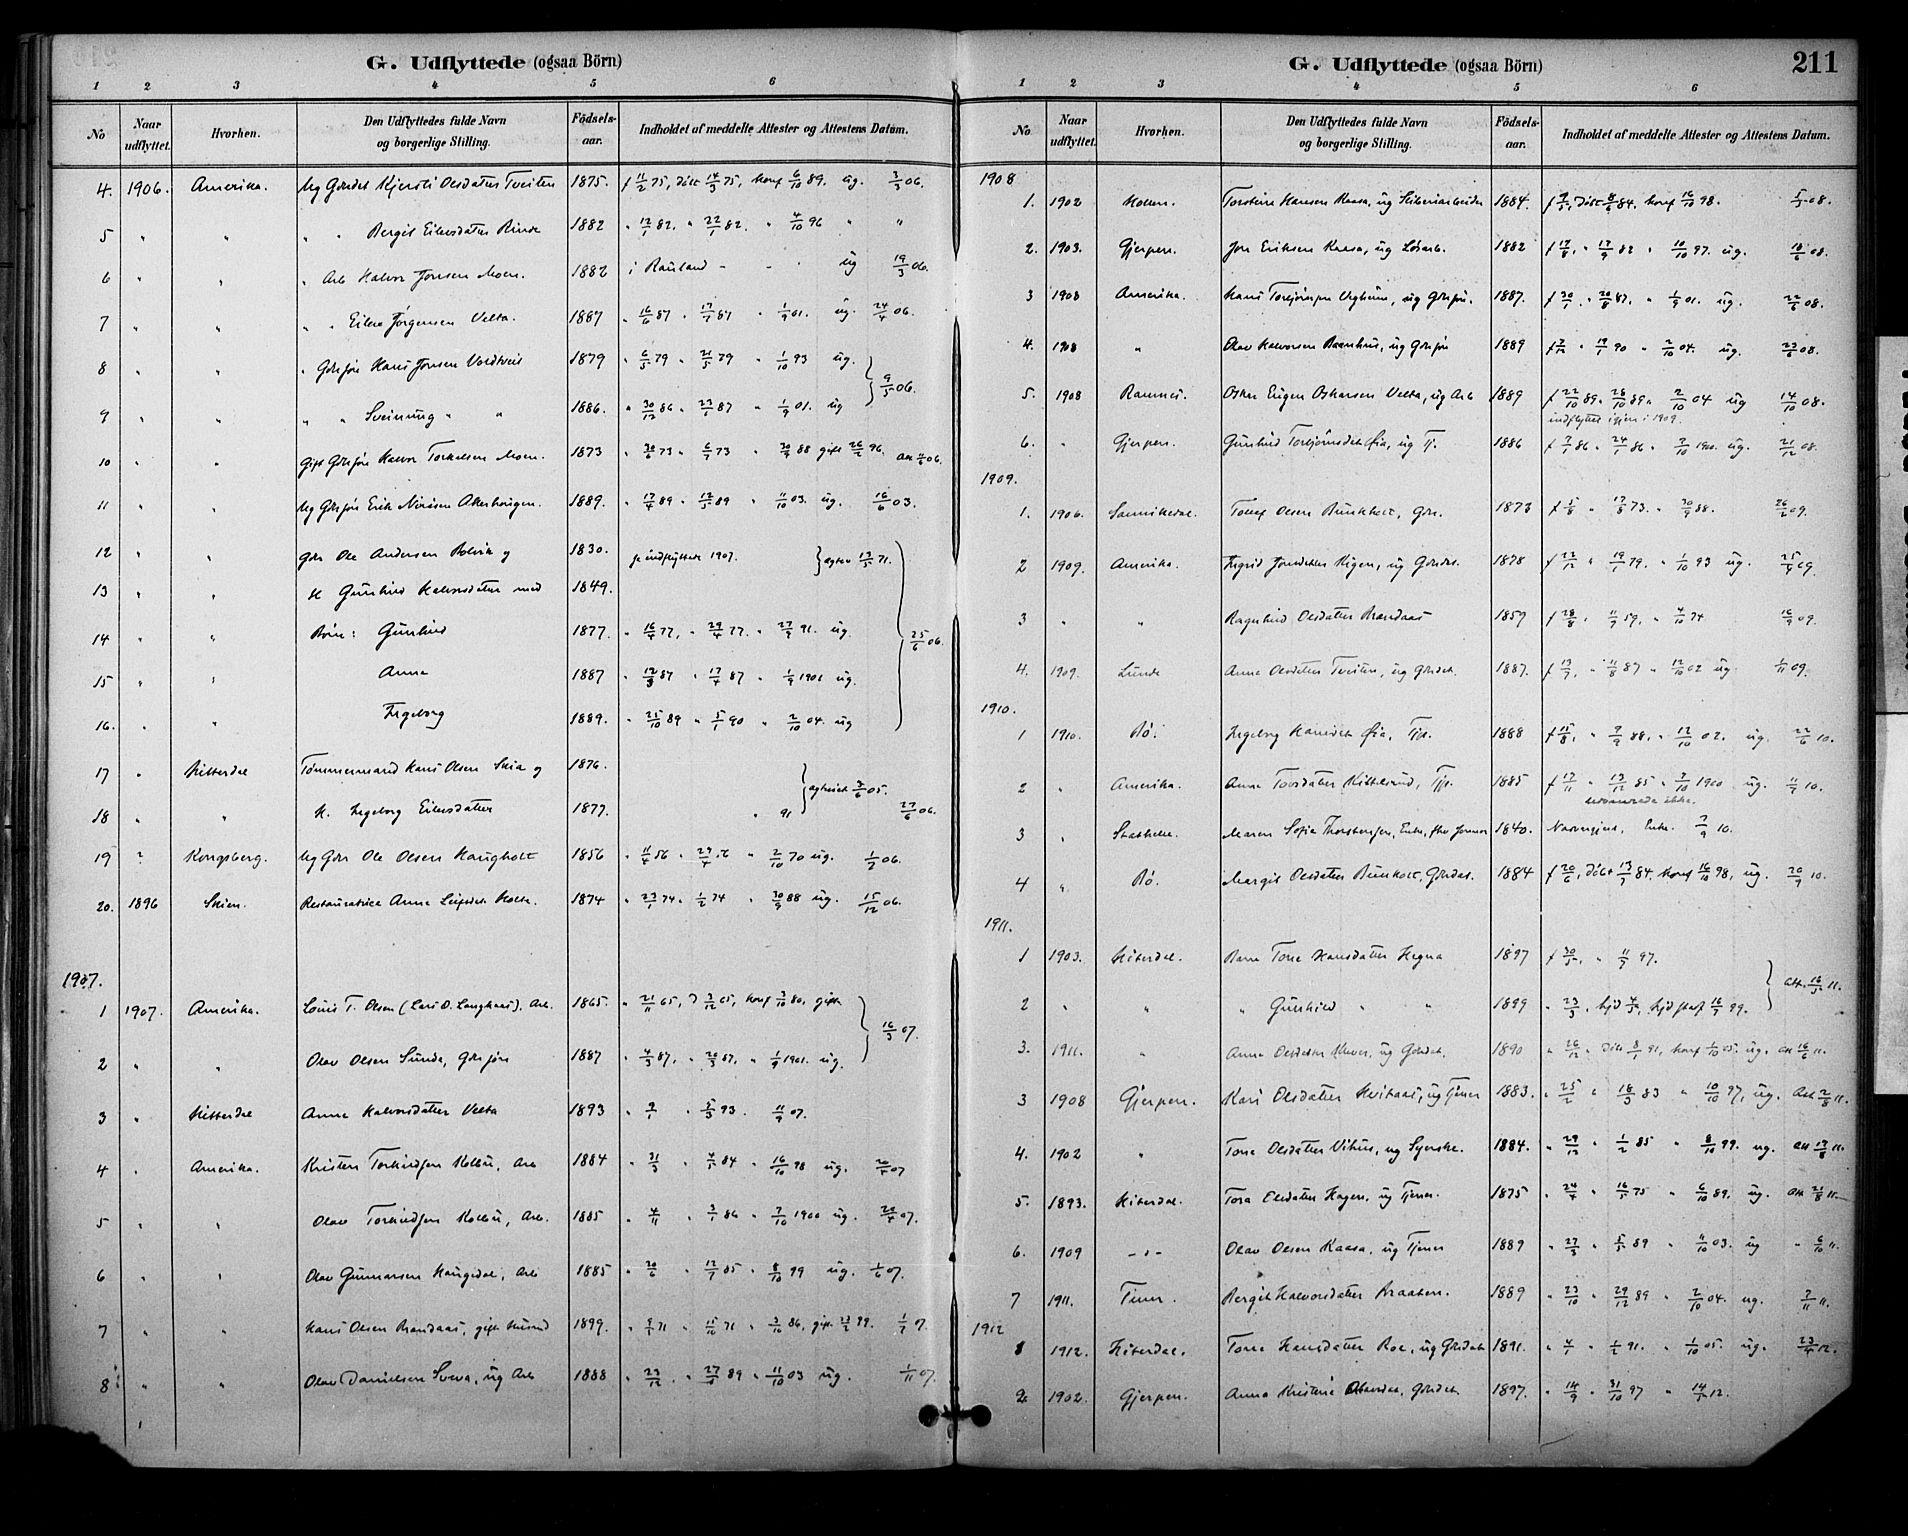 SAKO, Sauherad kirkebøker, F/Fa/L0009: Ministerialbok nr. I 9, 1887-1912, s. 211